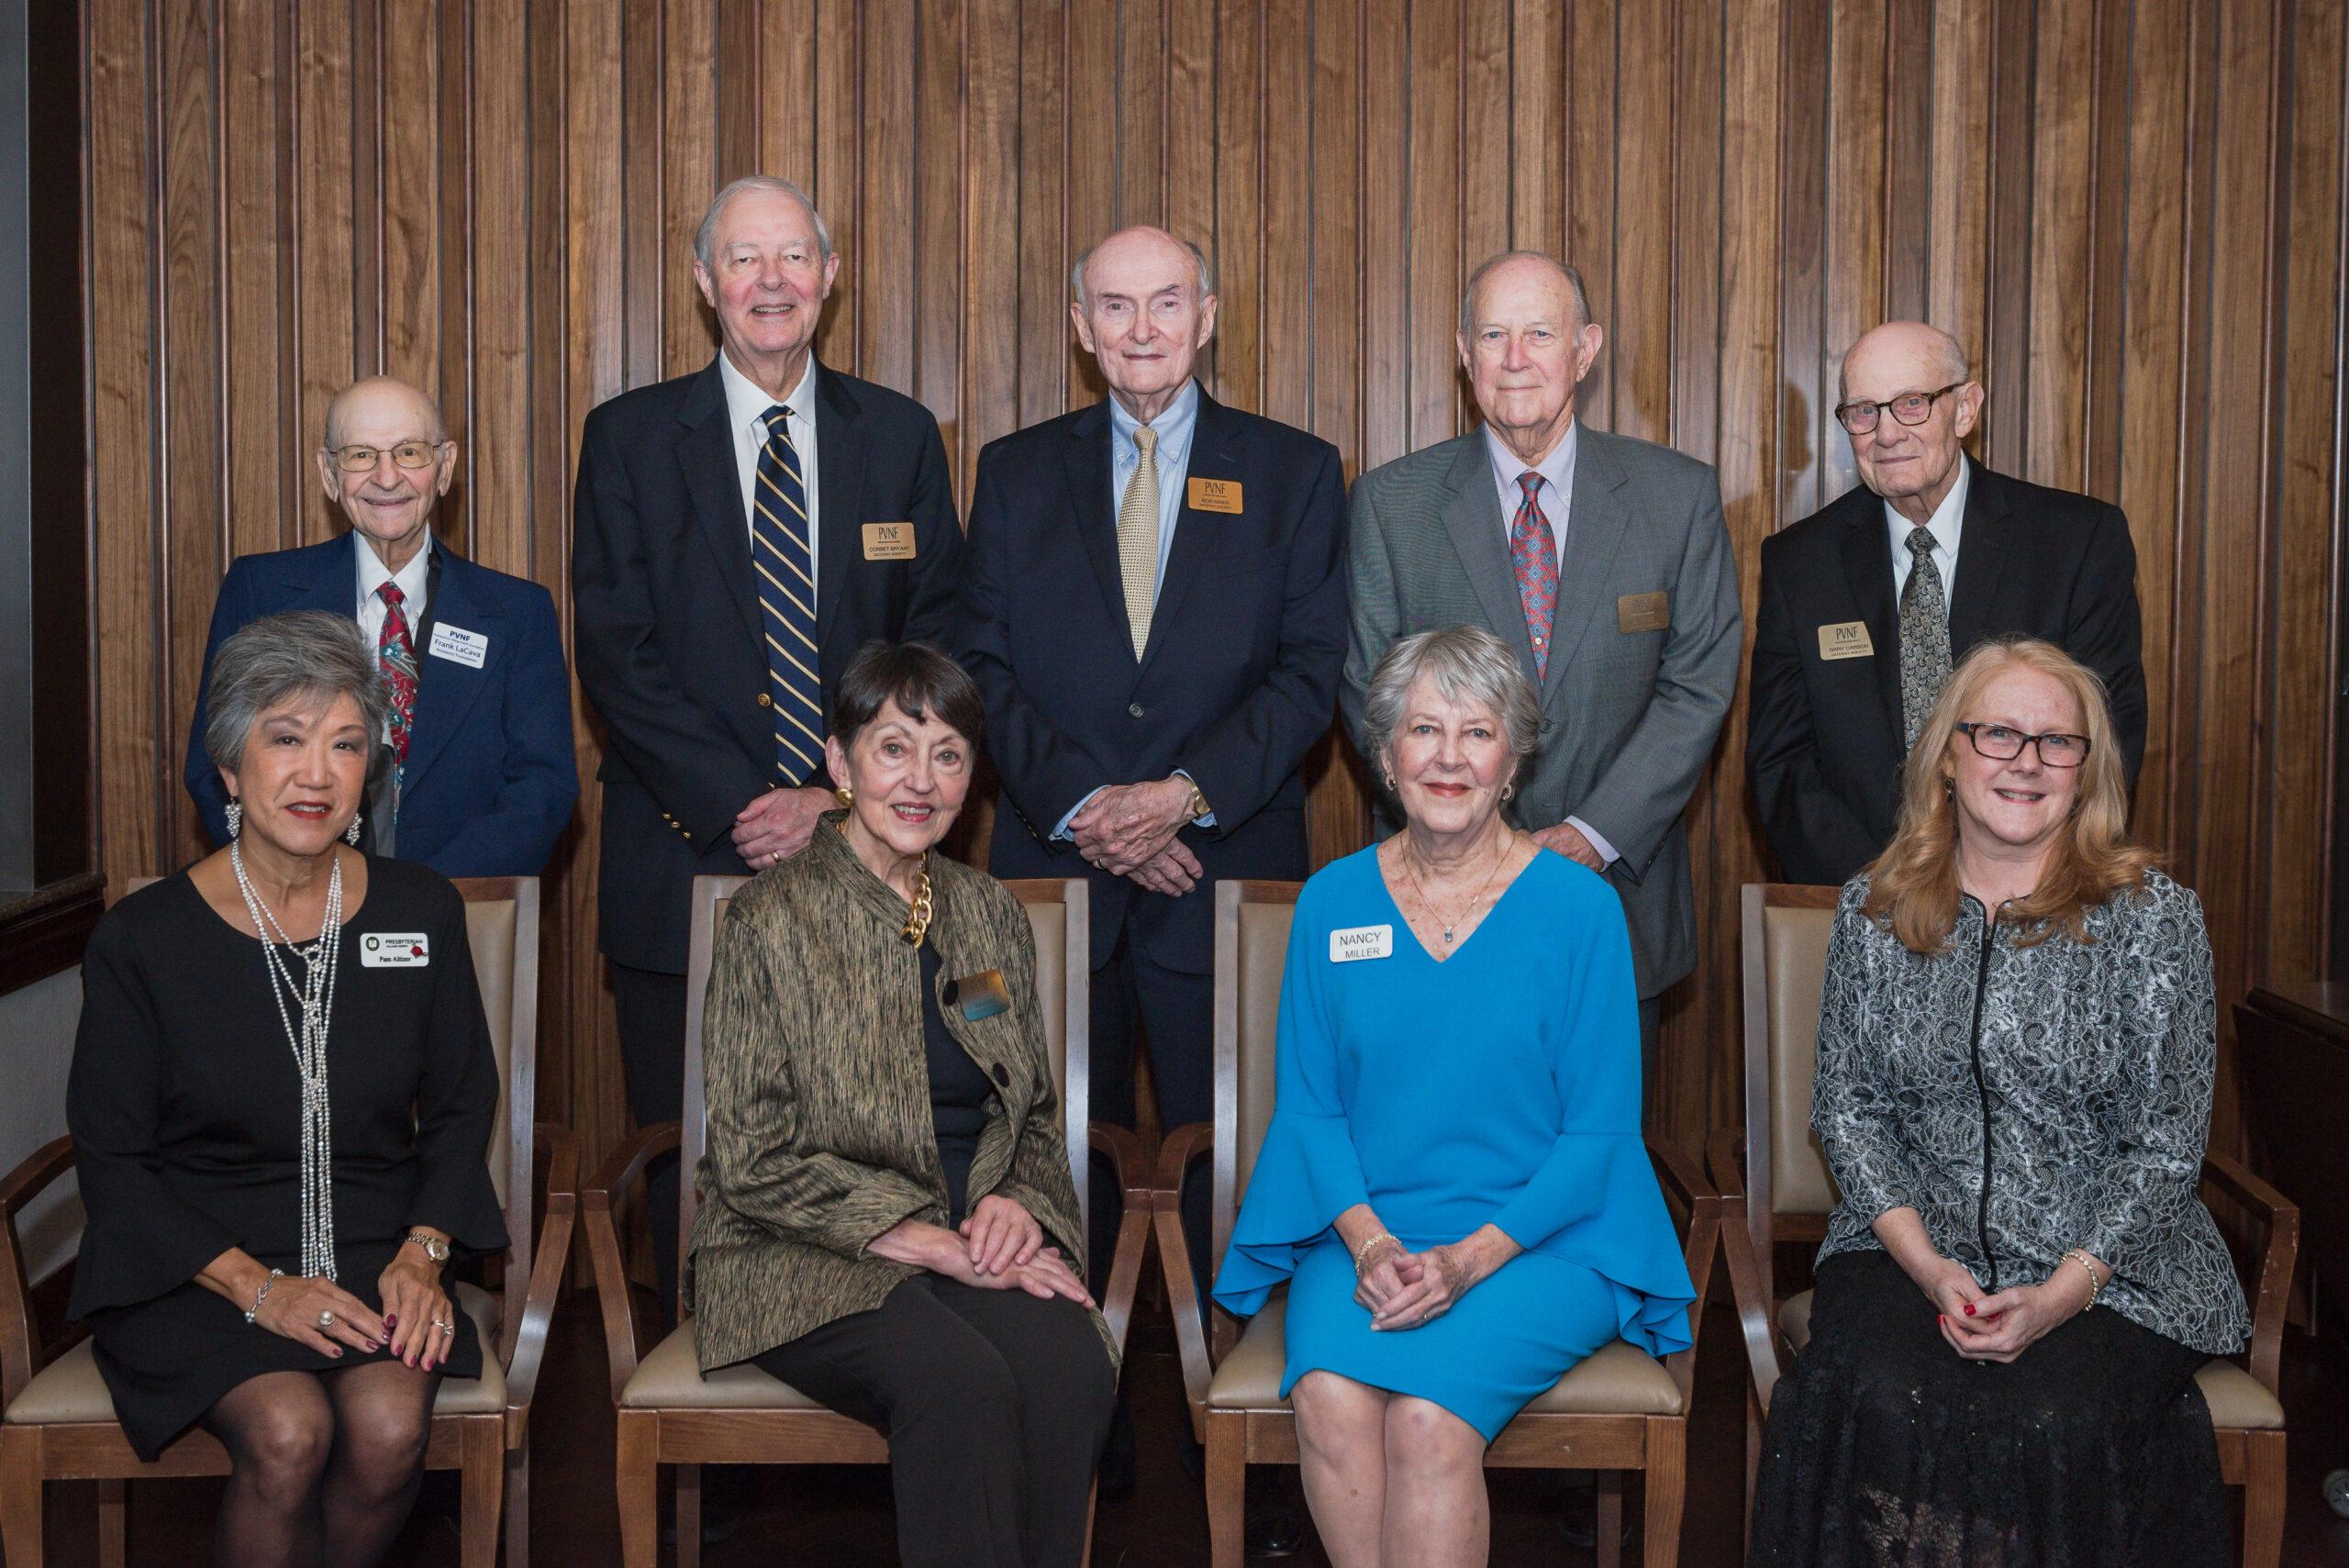 2020 Board of Trustees